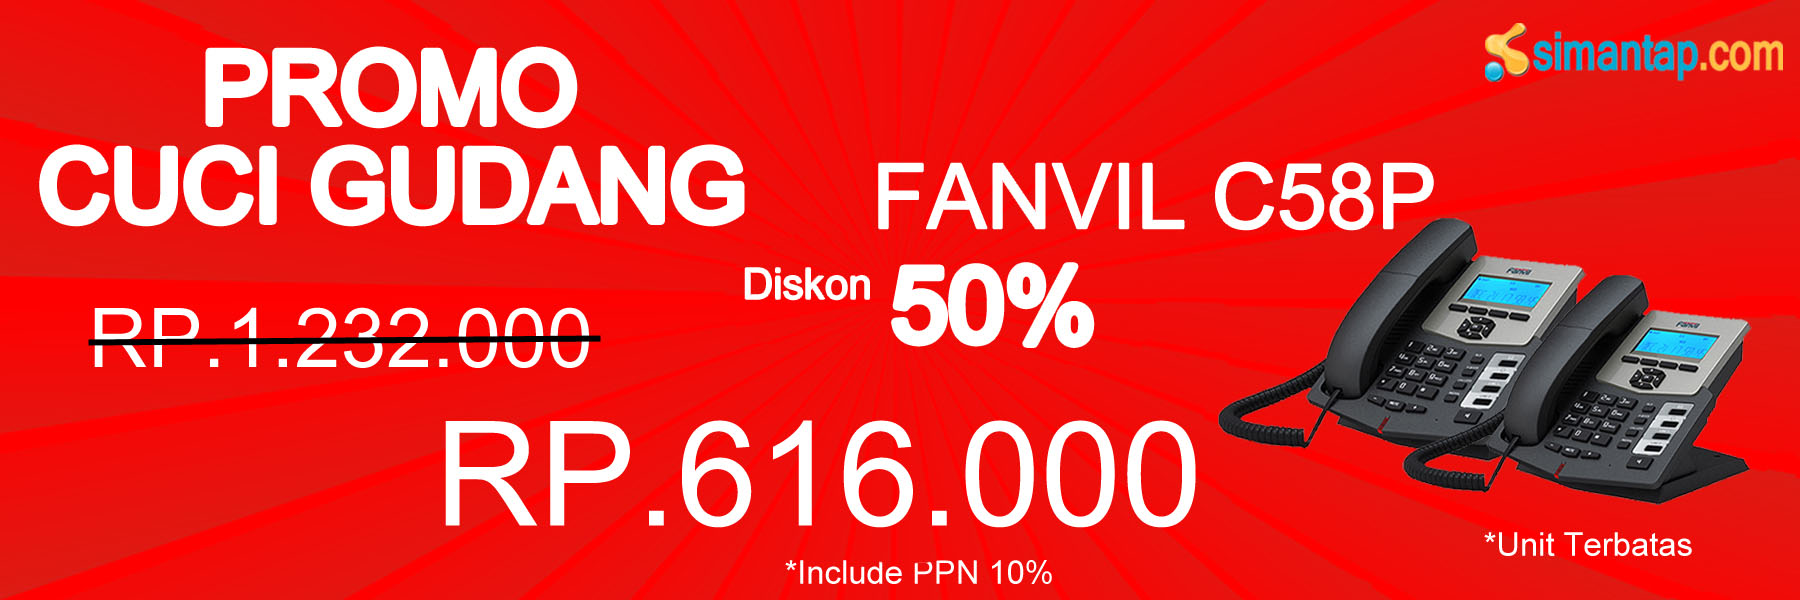 Promo Fanvil C58P